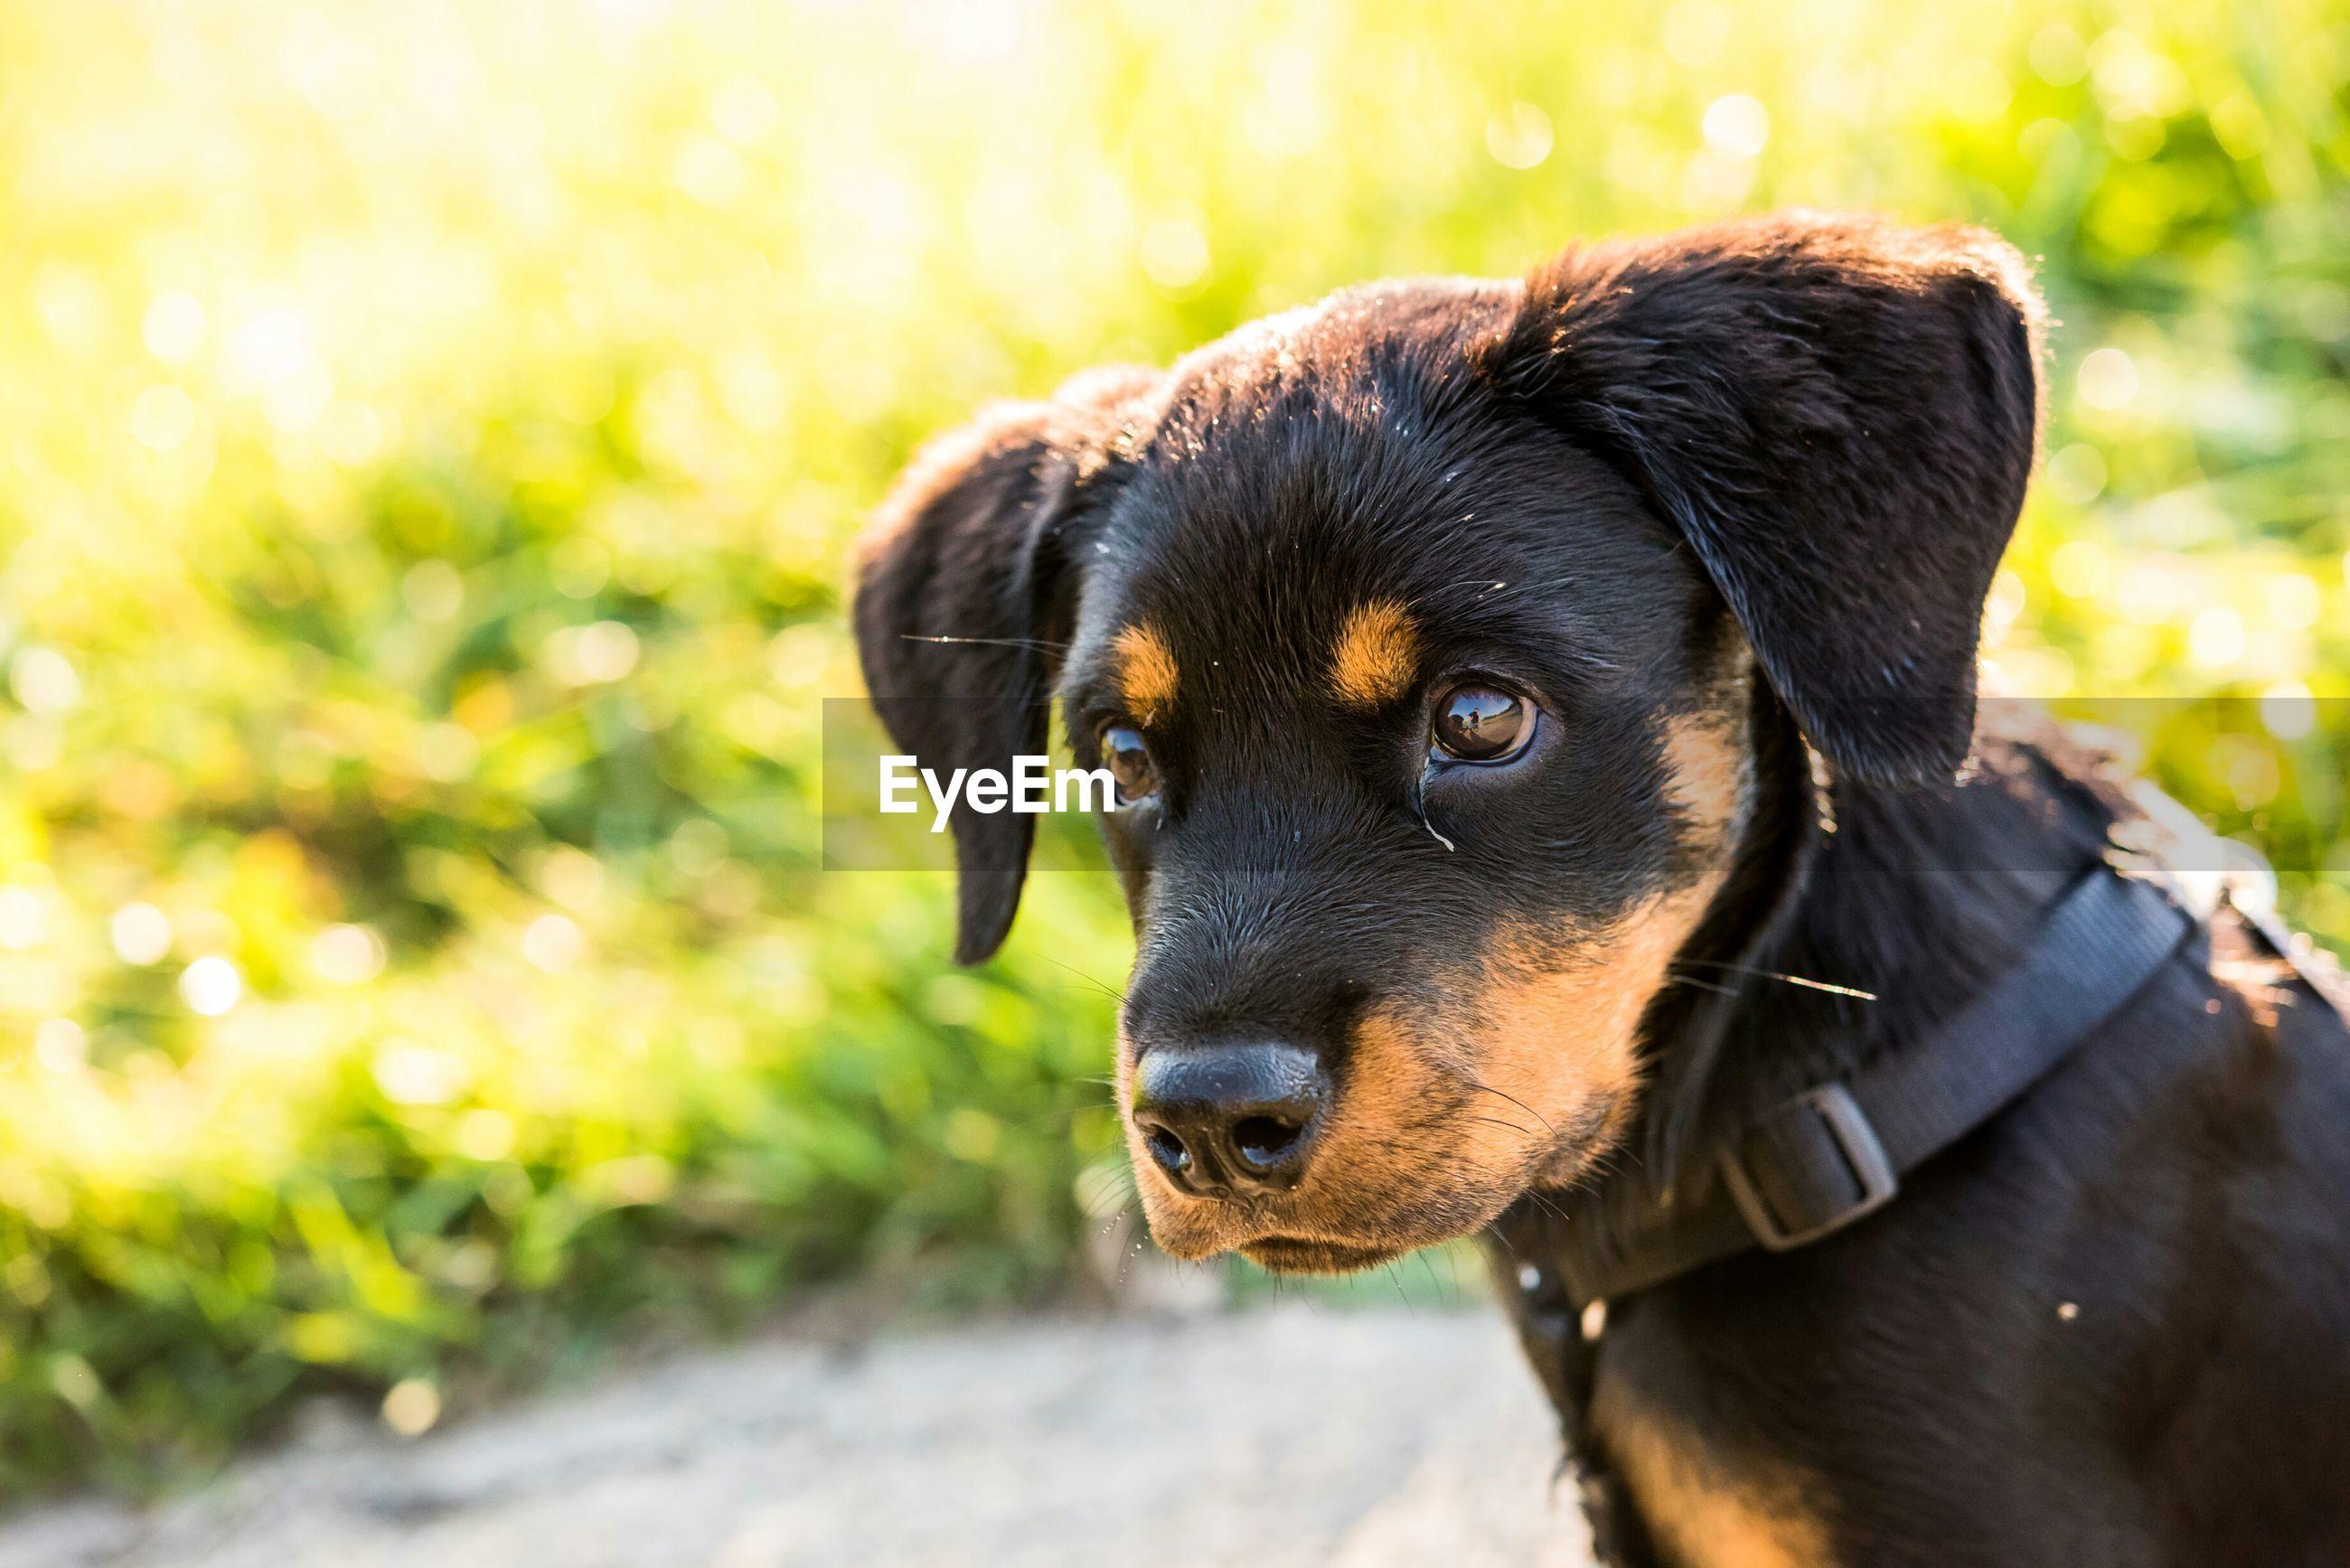 Close-up of dachshund puppy